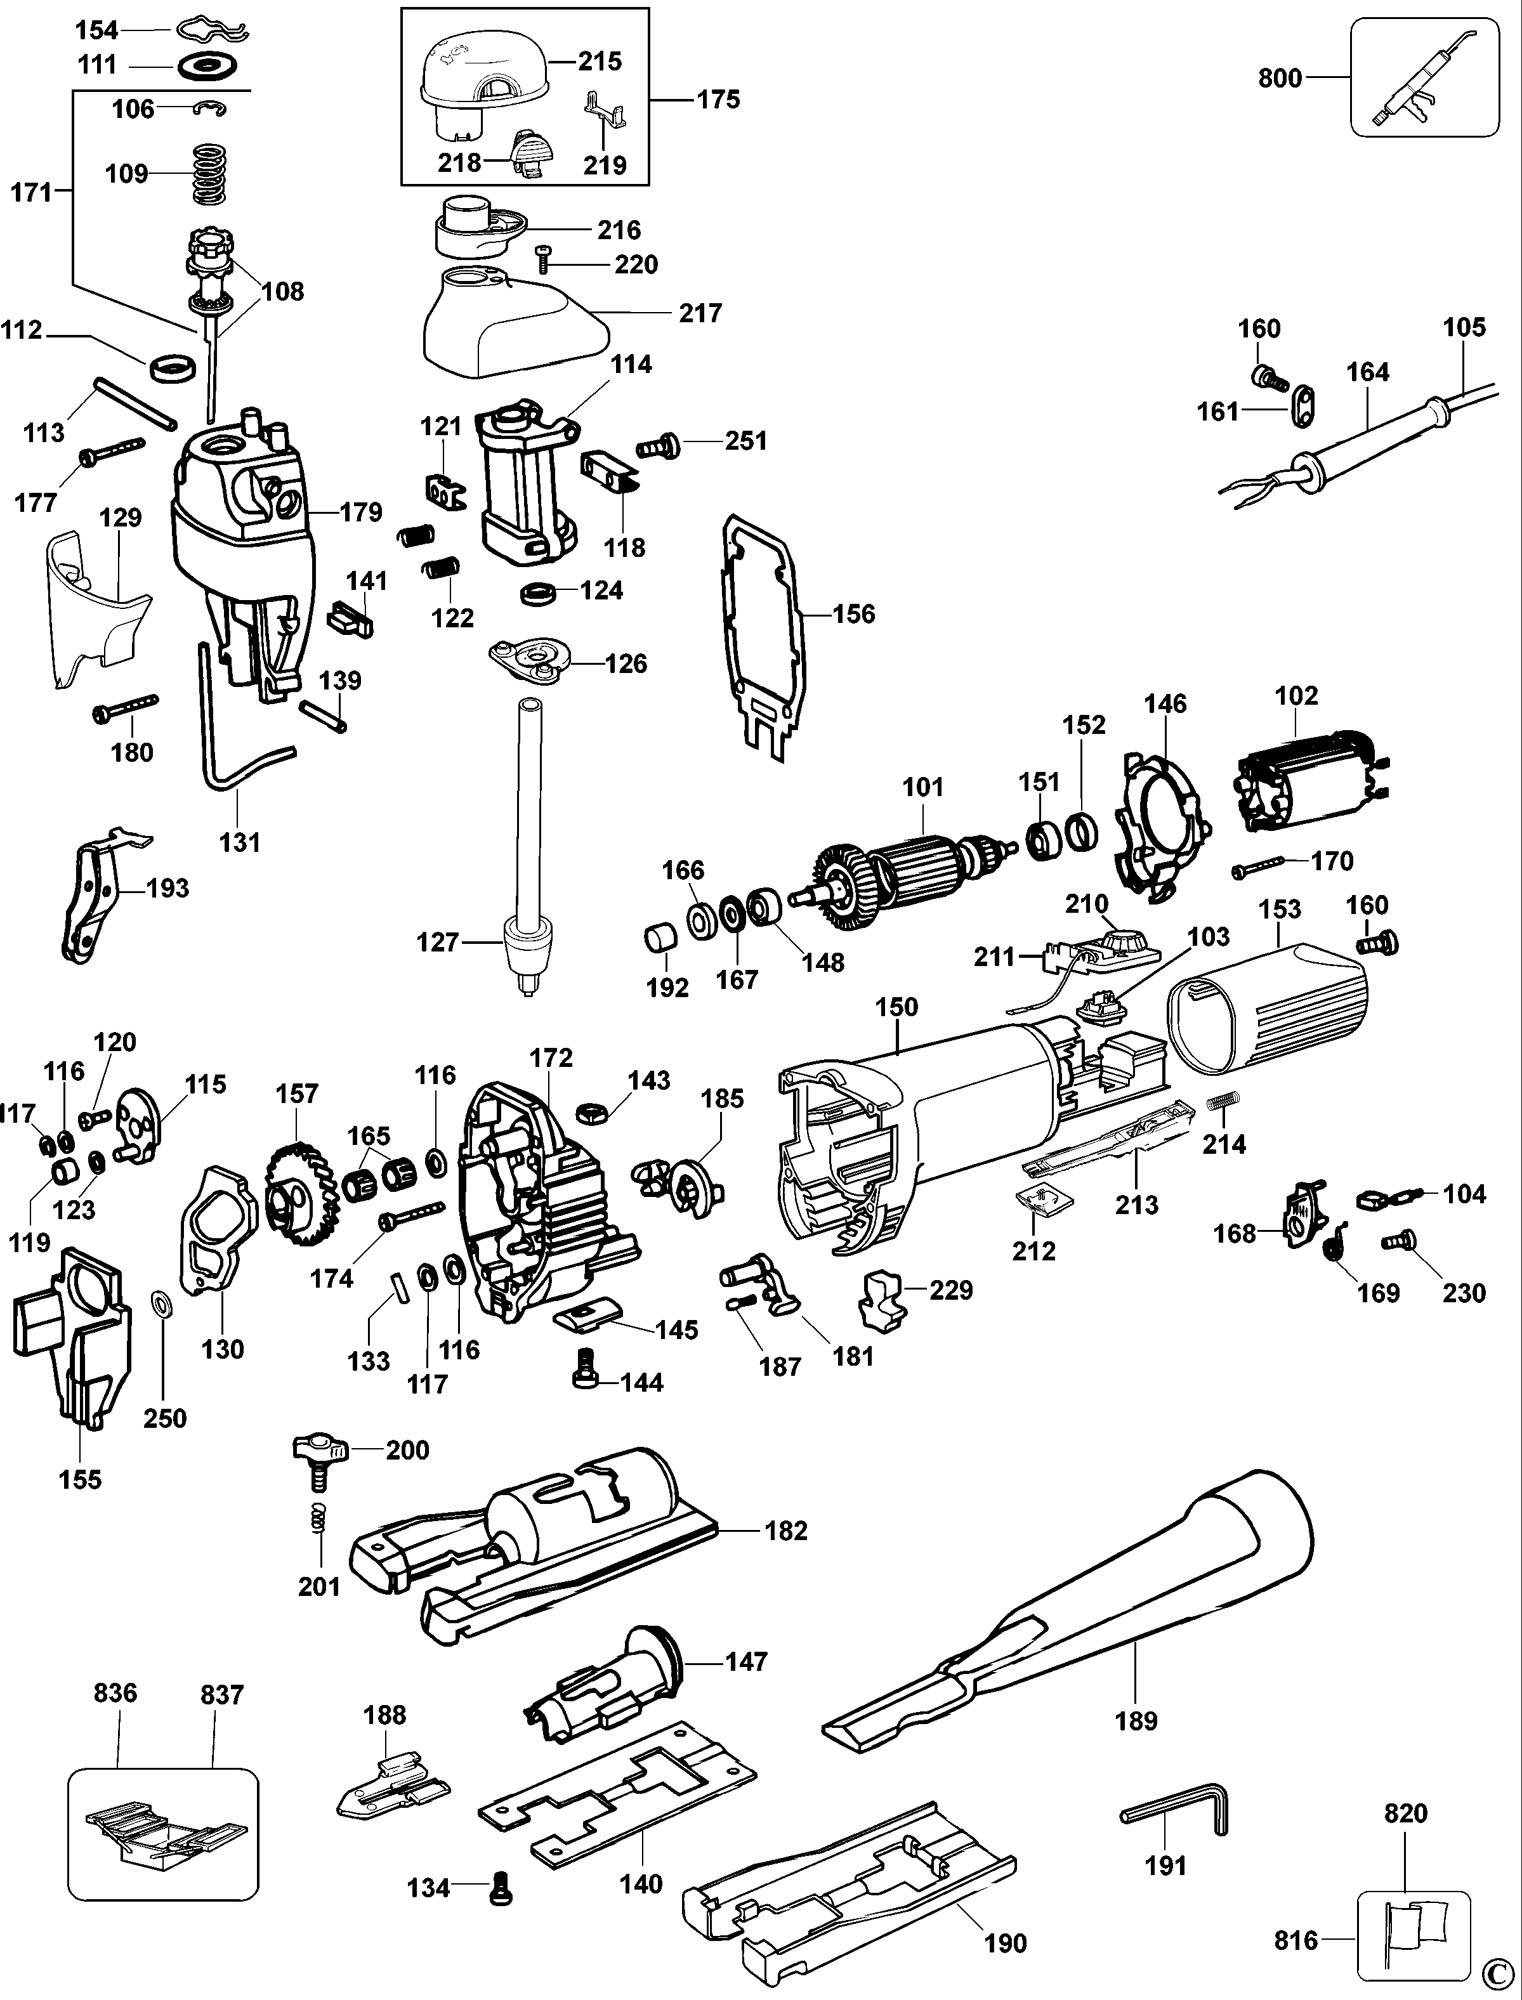 Spares For Dewalt Dw323 Jigsaw Type 3 Spare Dw323 Type 3